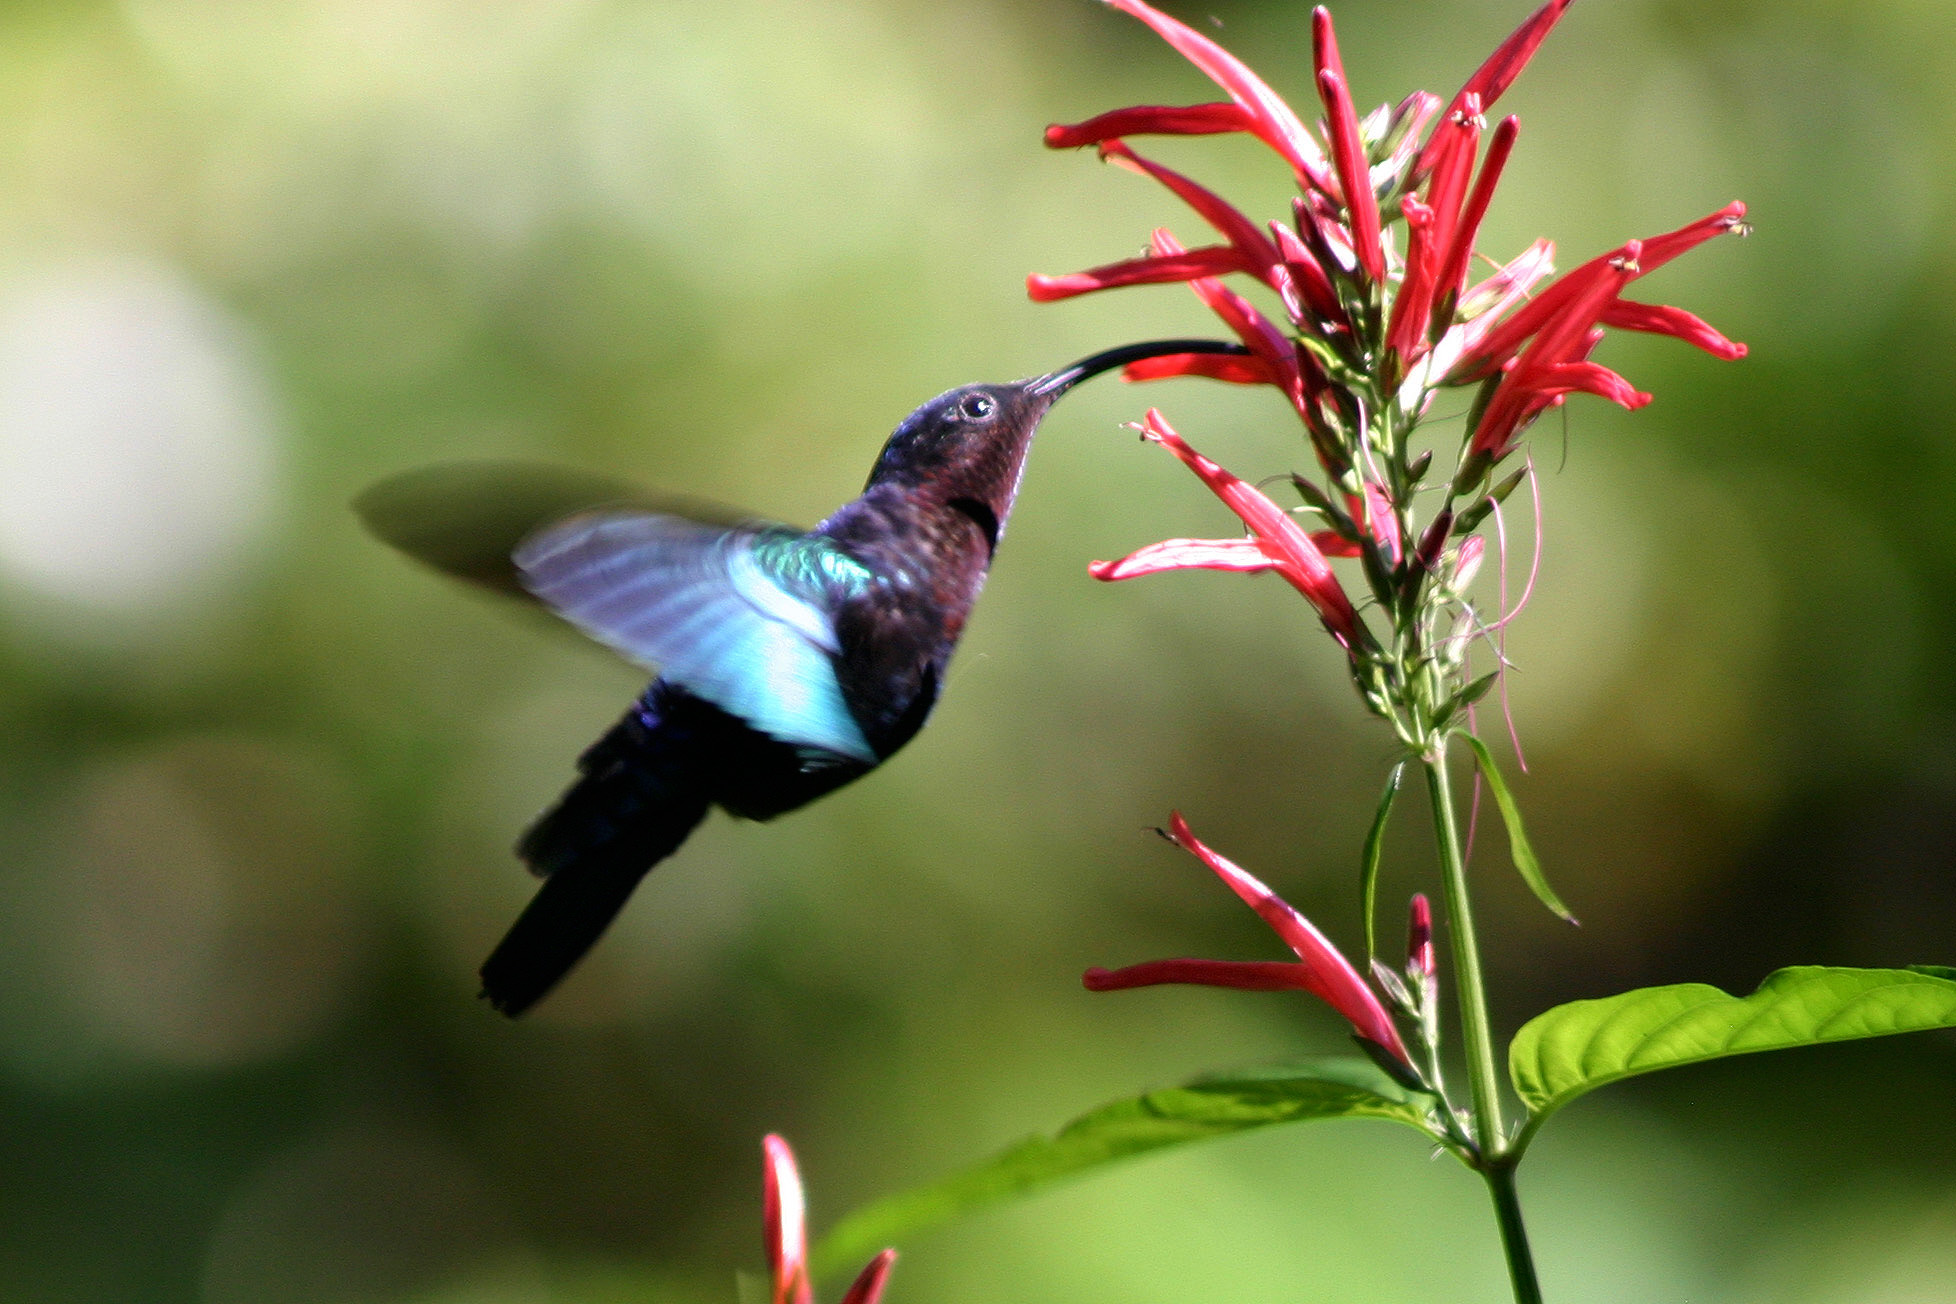 Datos sorprendentes sobre los colibríes de abeja OneKindPlanet Animal Education